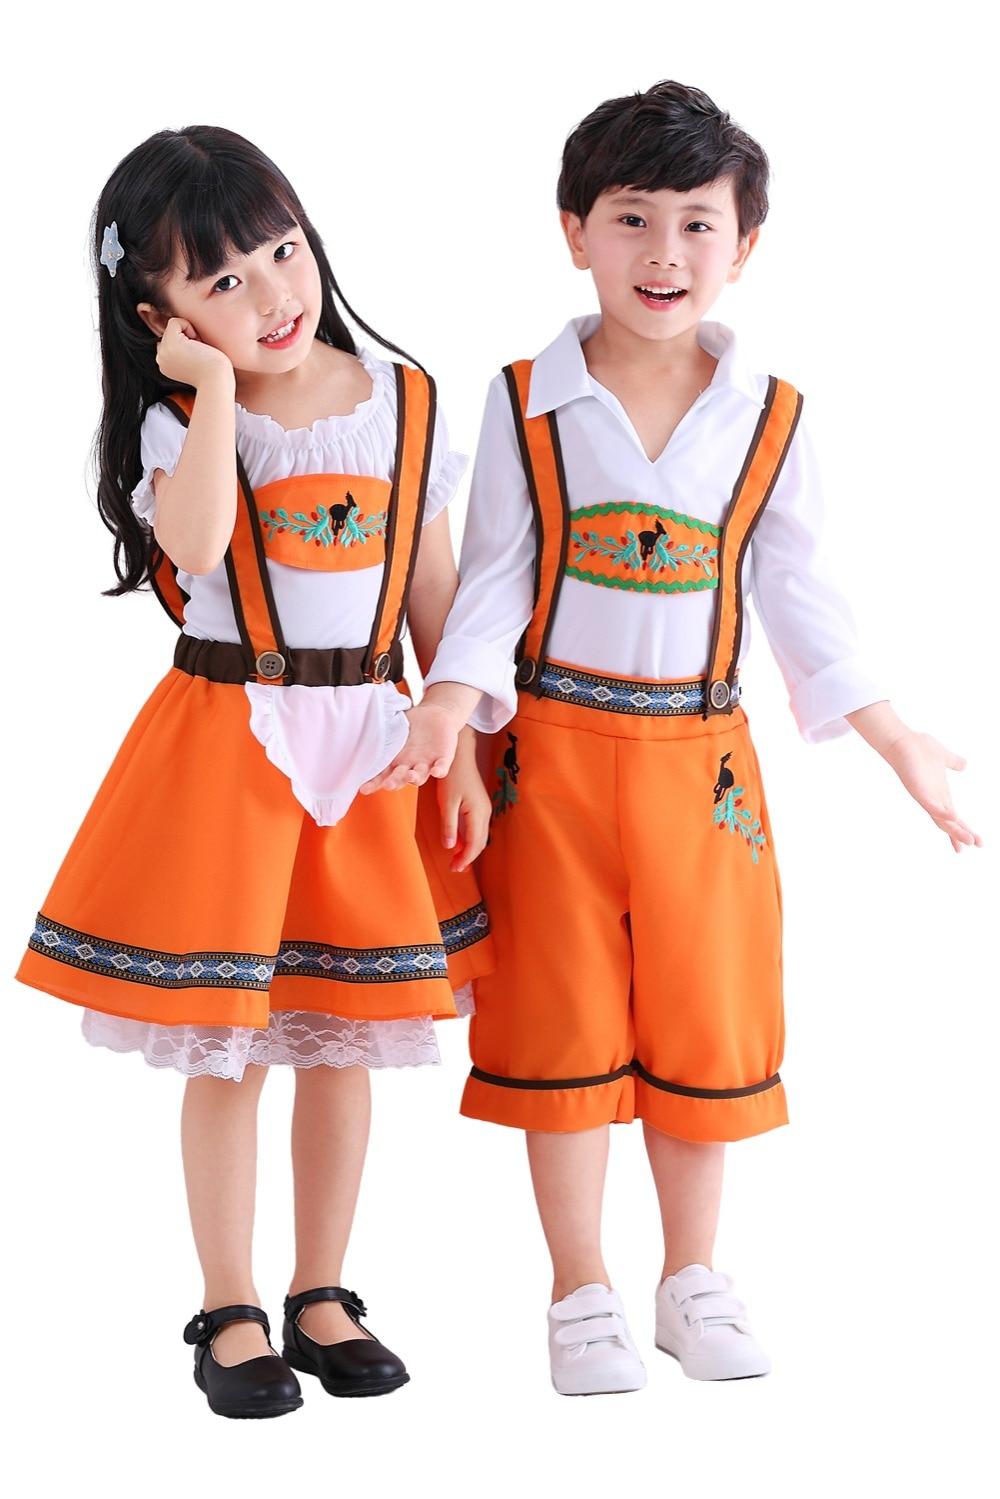 Oktoberfest Cosplay Costume Beer Festival Girls Orange Yellow Beer Skirt